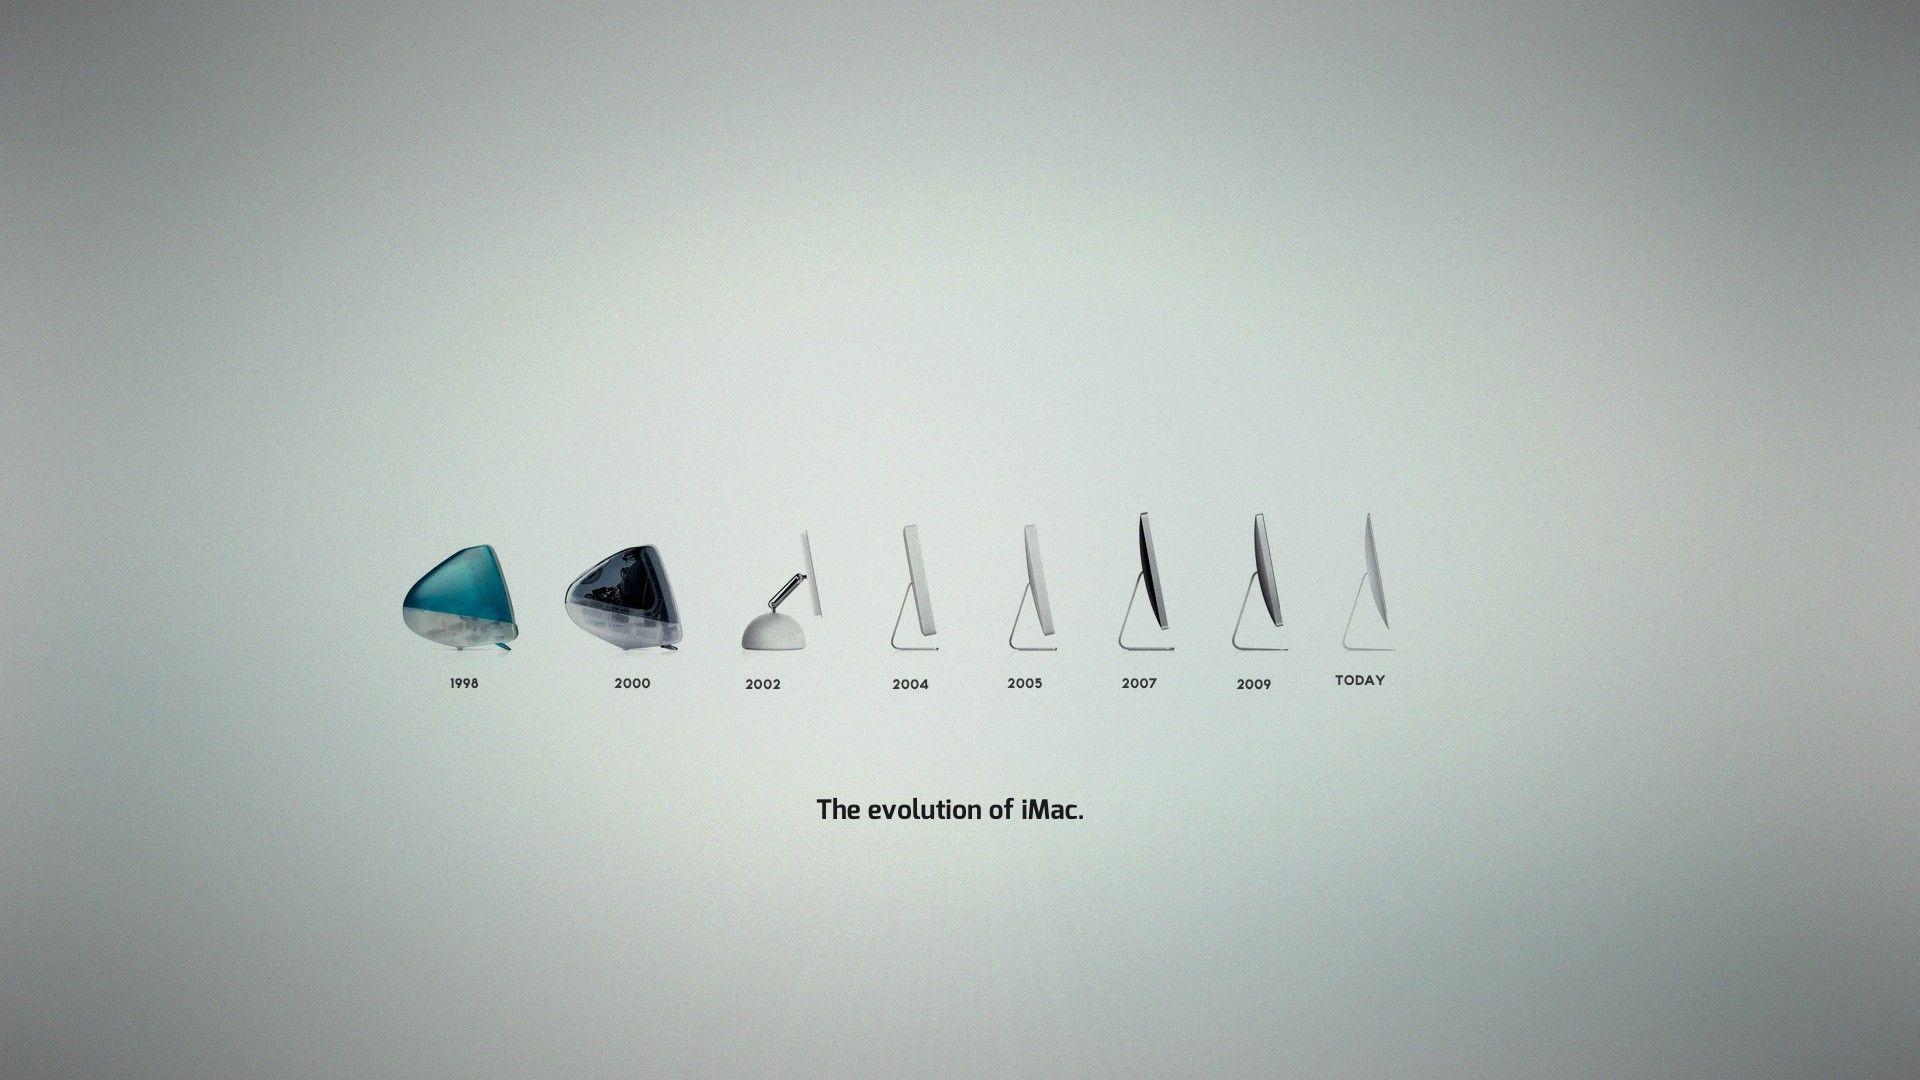 Mac Macintosh PC computers evolution wallpaper (2384779